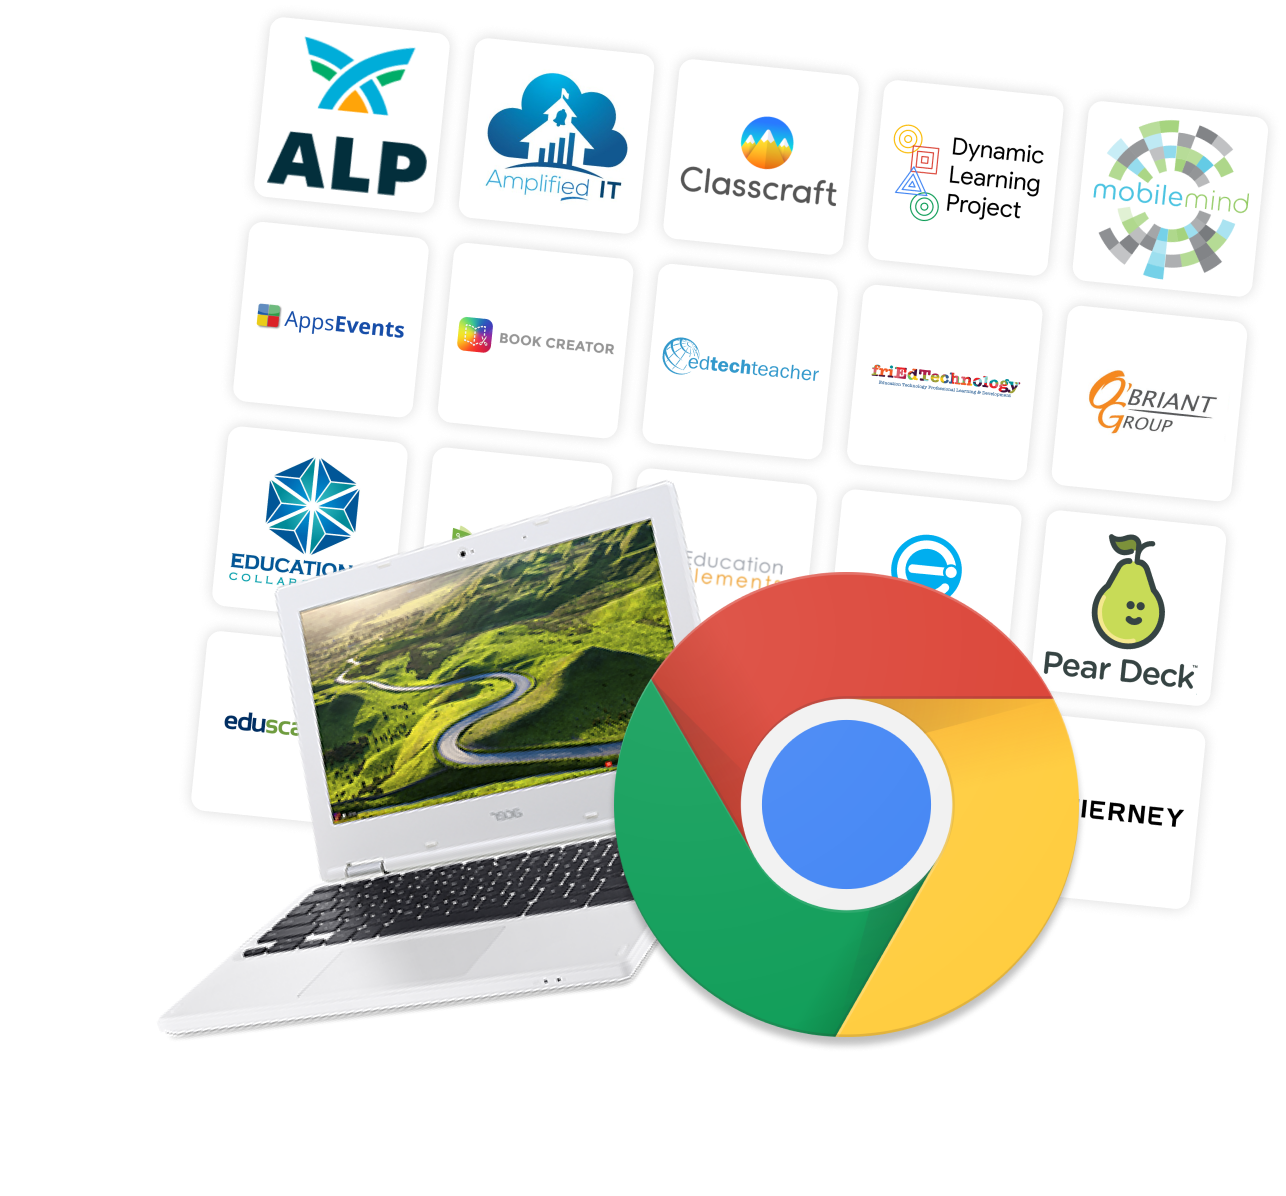 Chrome Services